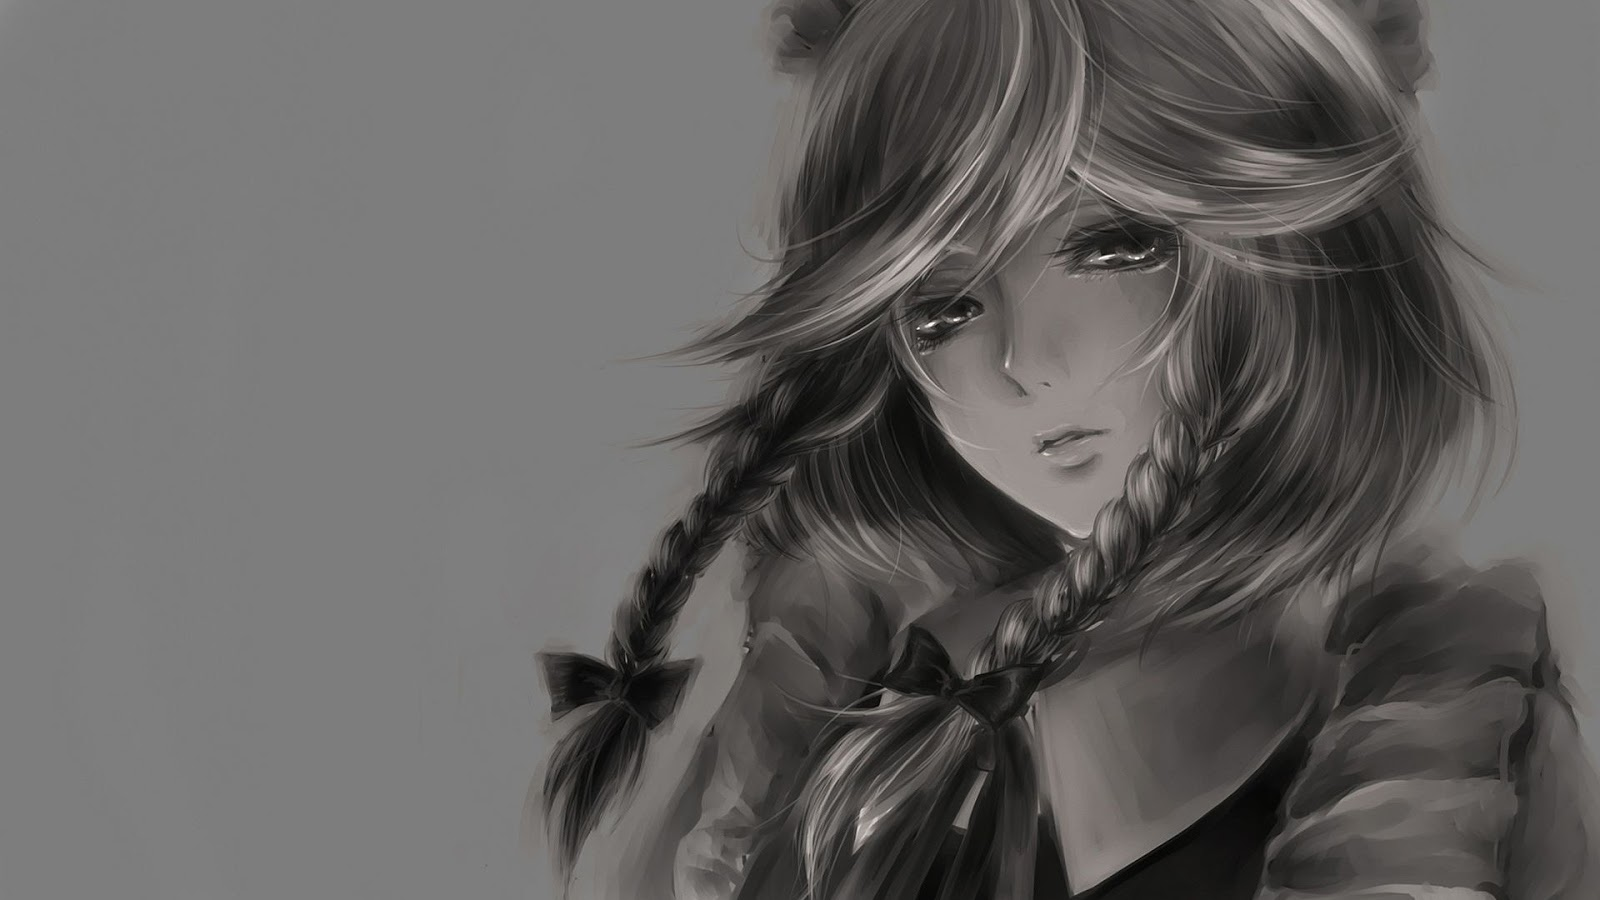 Gambar gambar anime yang sangat cantik